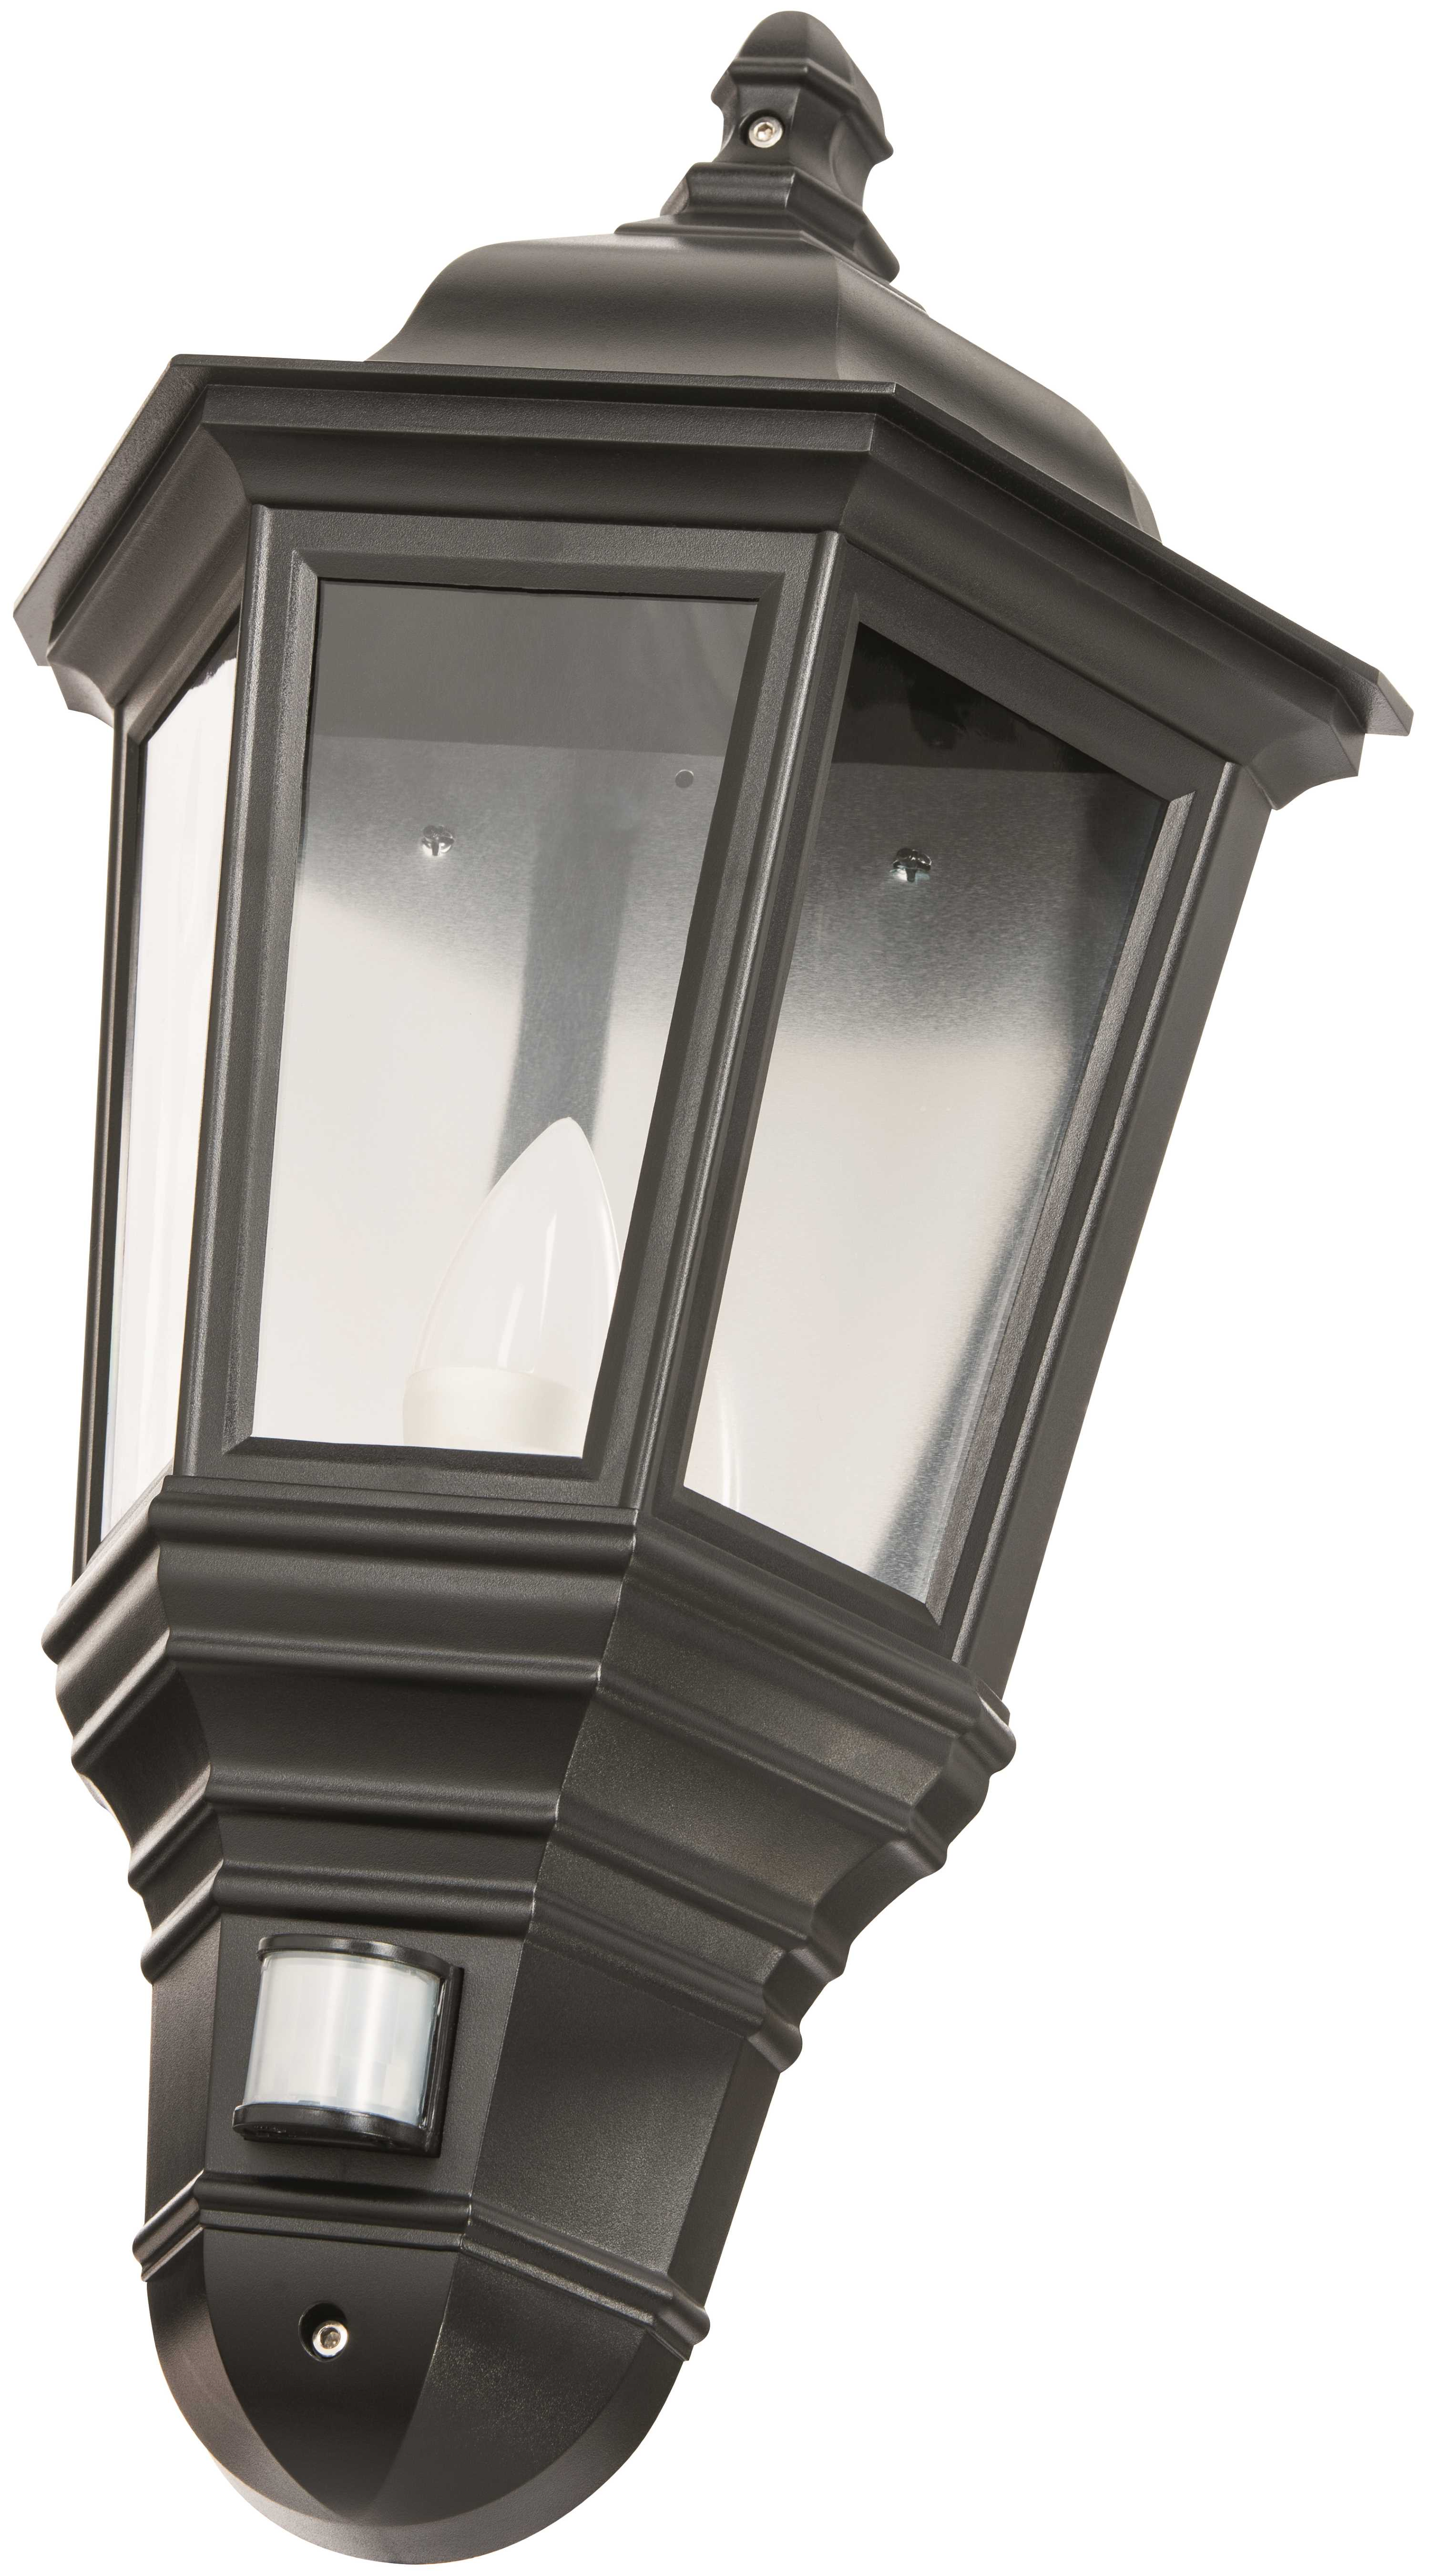 Timeguard CLLEDH44PIRB Black LED Half Carriage Lantern PIR c/w LED Candle Lamp